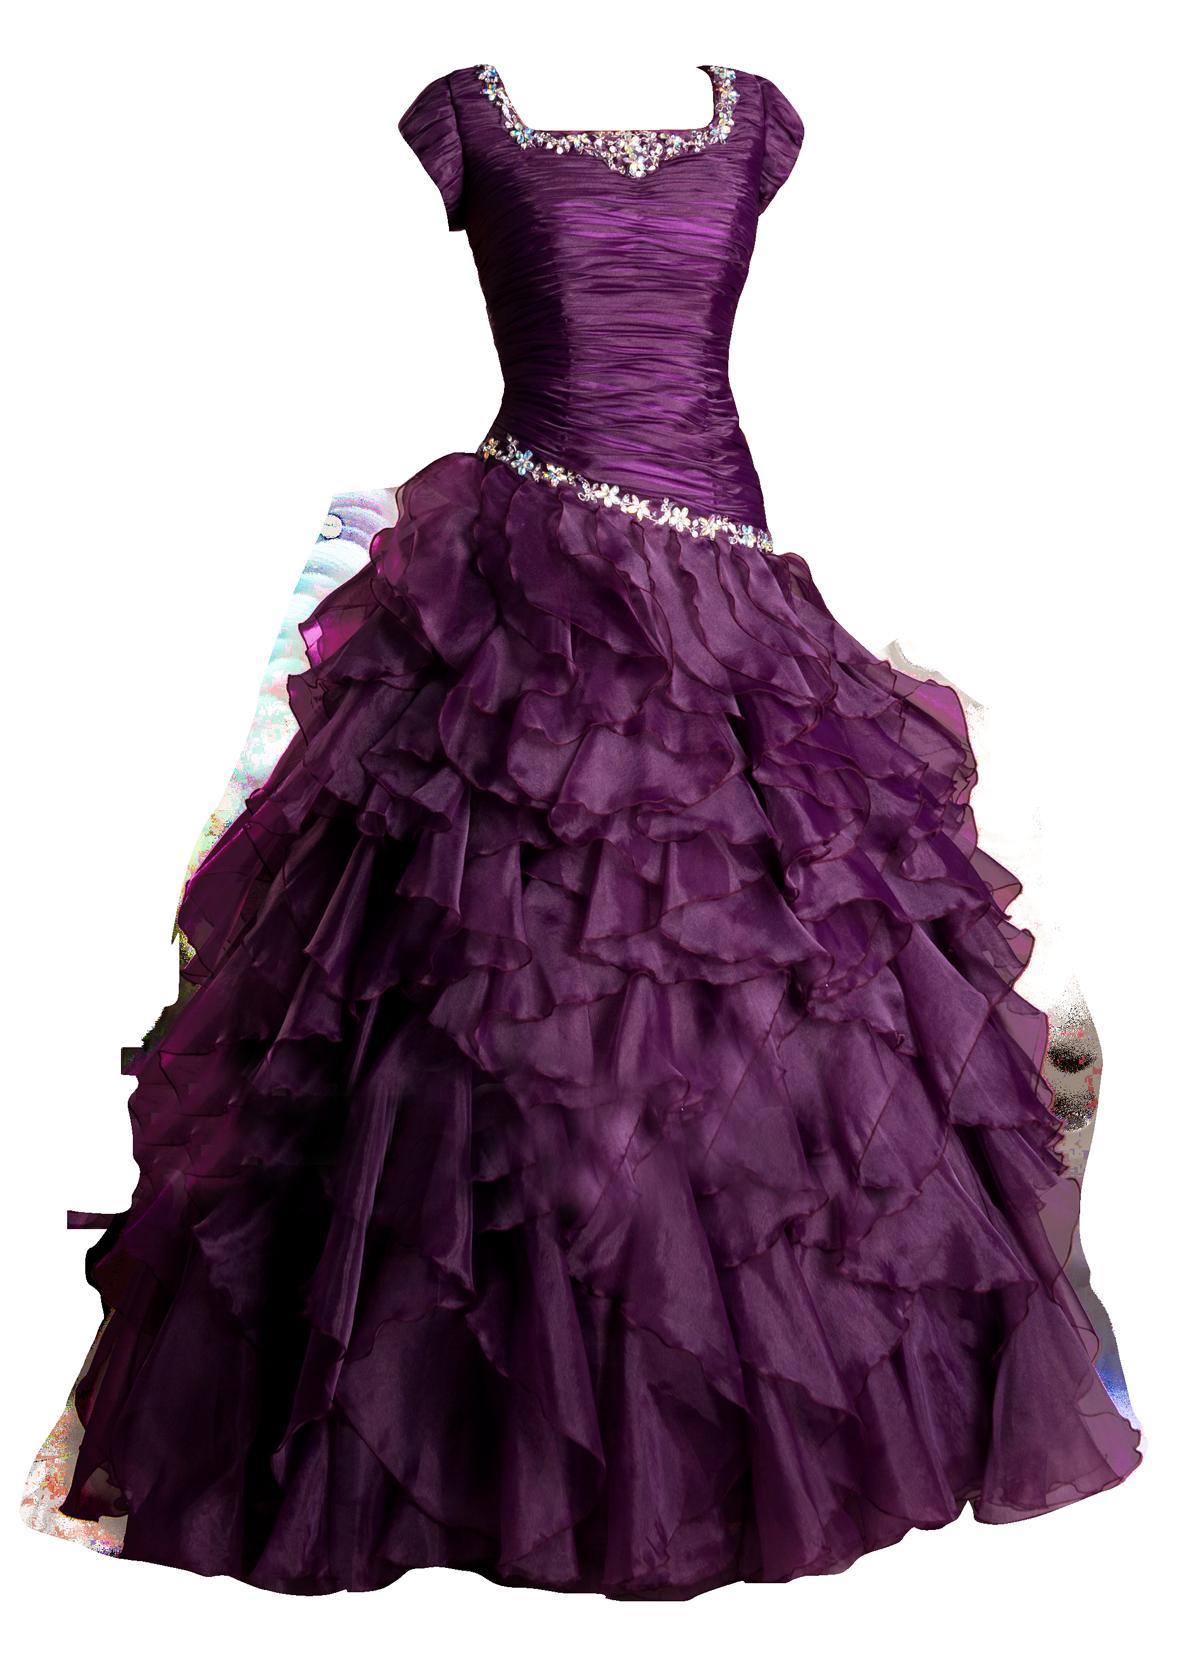 Girl Dress Png Image - Purepng  Free Transparent Cc0 Png -3848